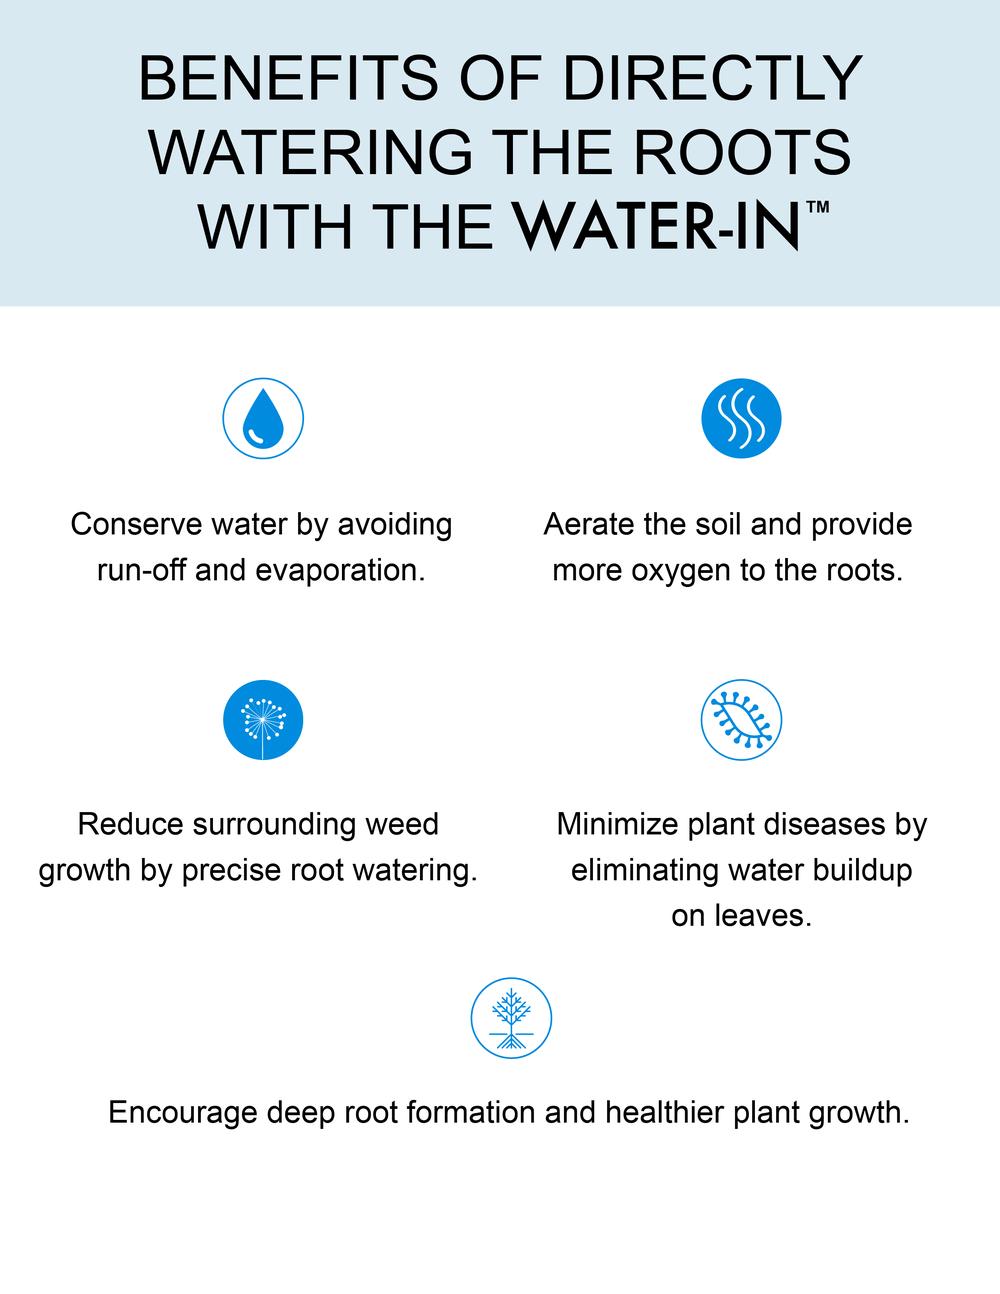 Gardinnovations Water-In Benefits